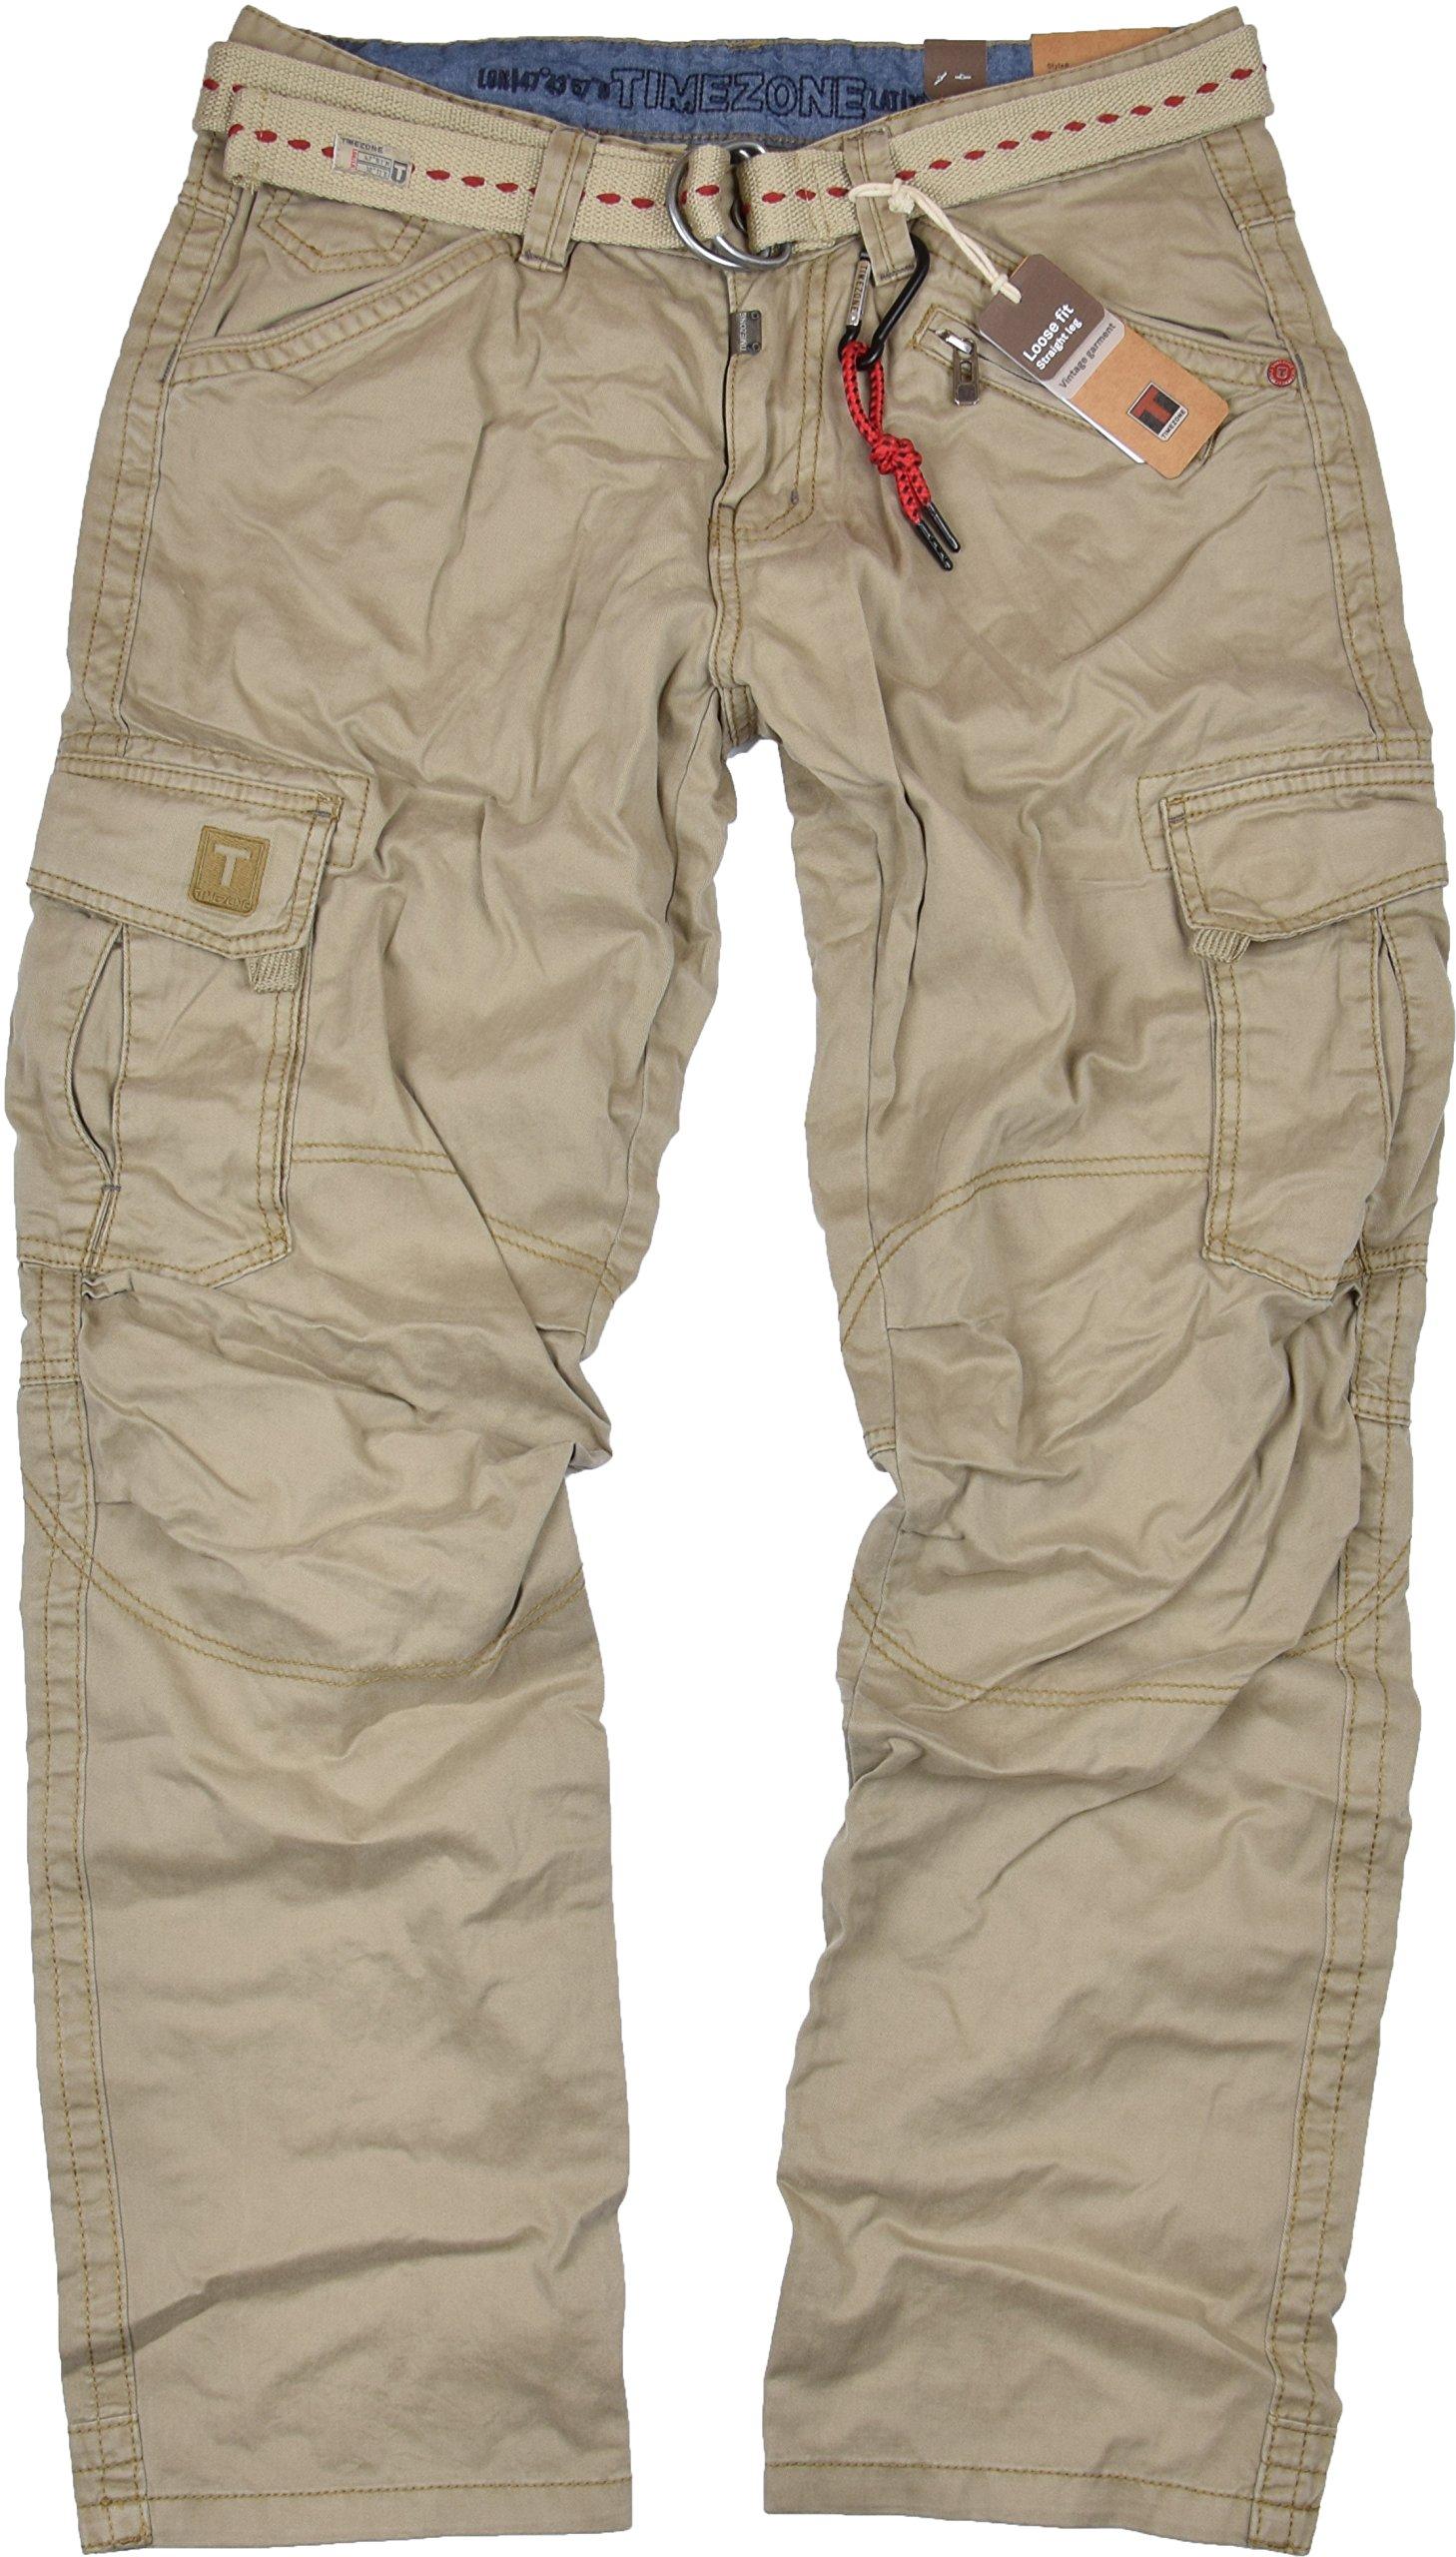 Timezone Herren Cargo Jeans Hose Benito TZ 3387 Scrub Blue